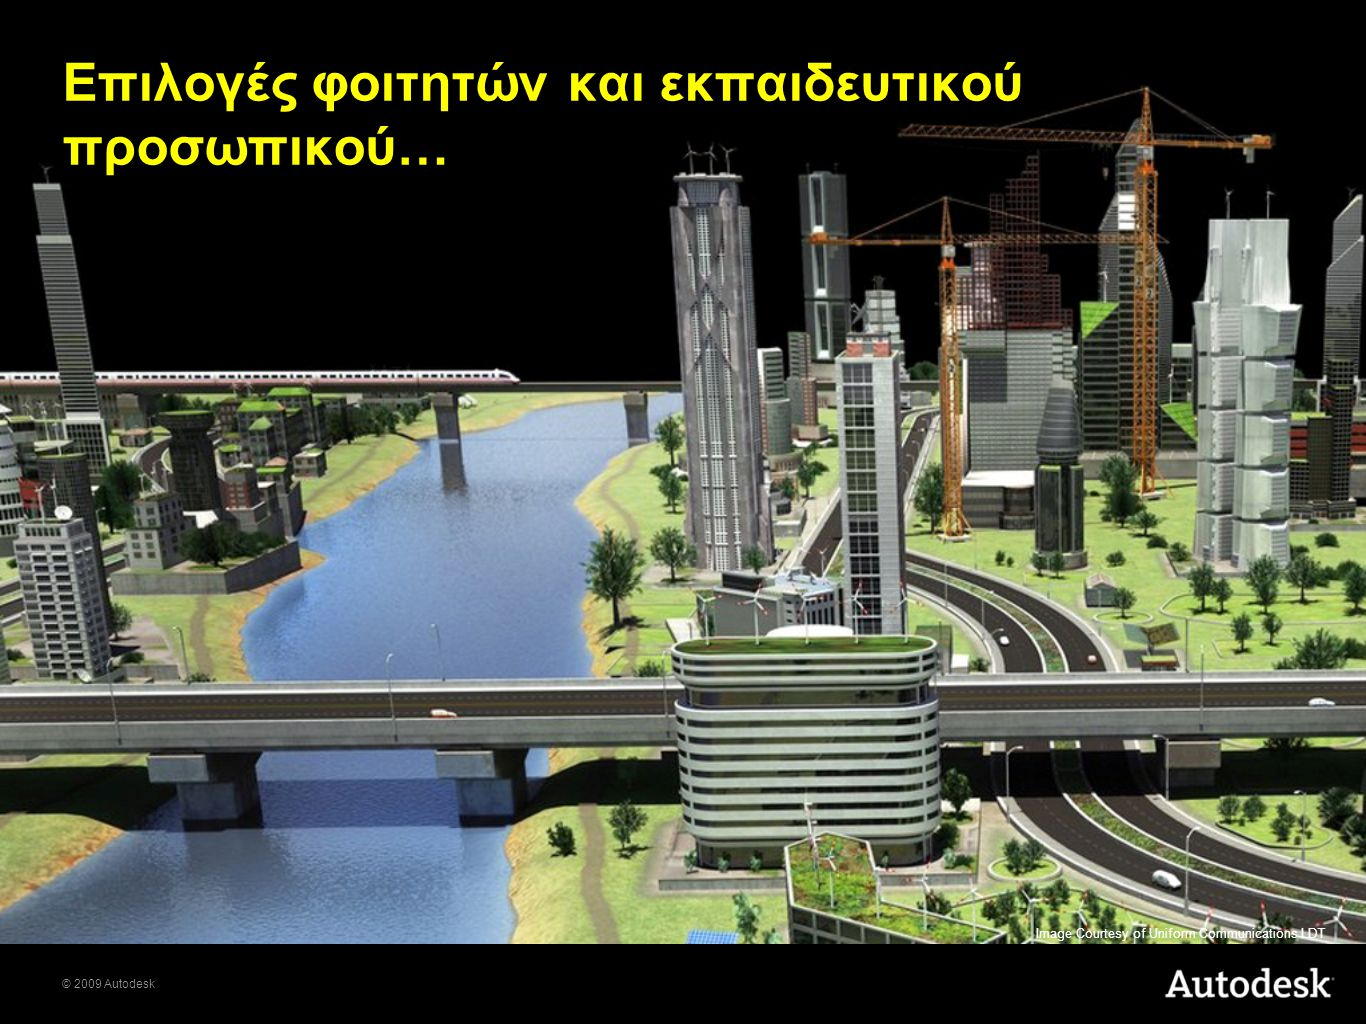 © 2009 Autodesk Επιλογές φοιτητών και εκπαιδευτικού προσωπικού… Image Courtesy of Uniform Communications LDT